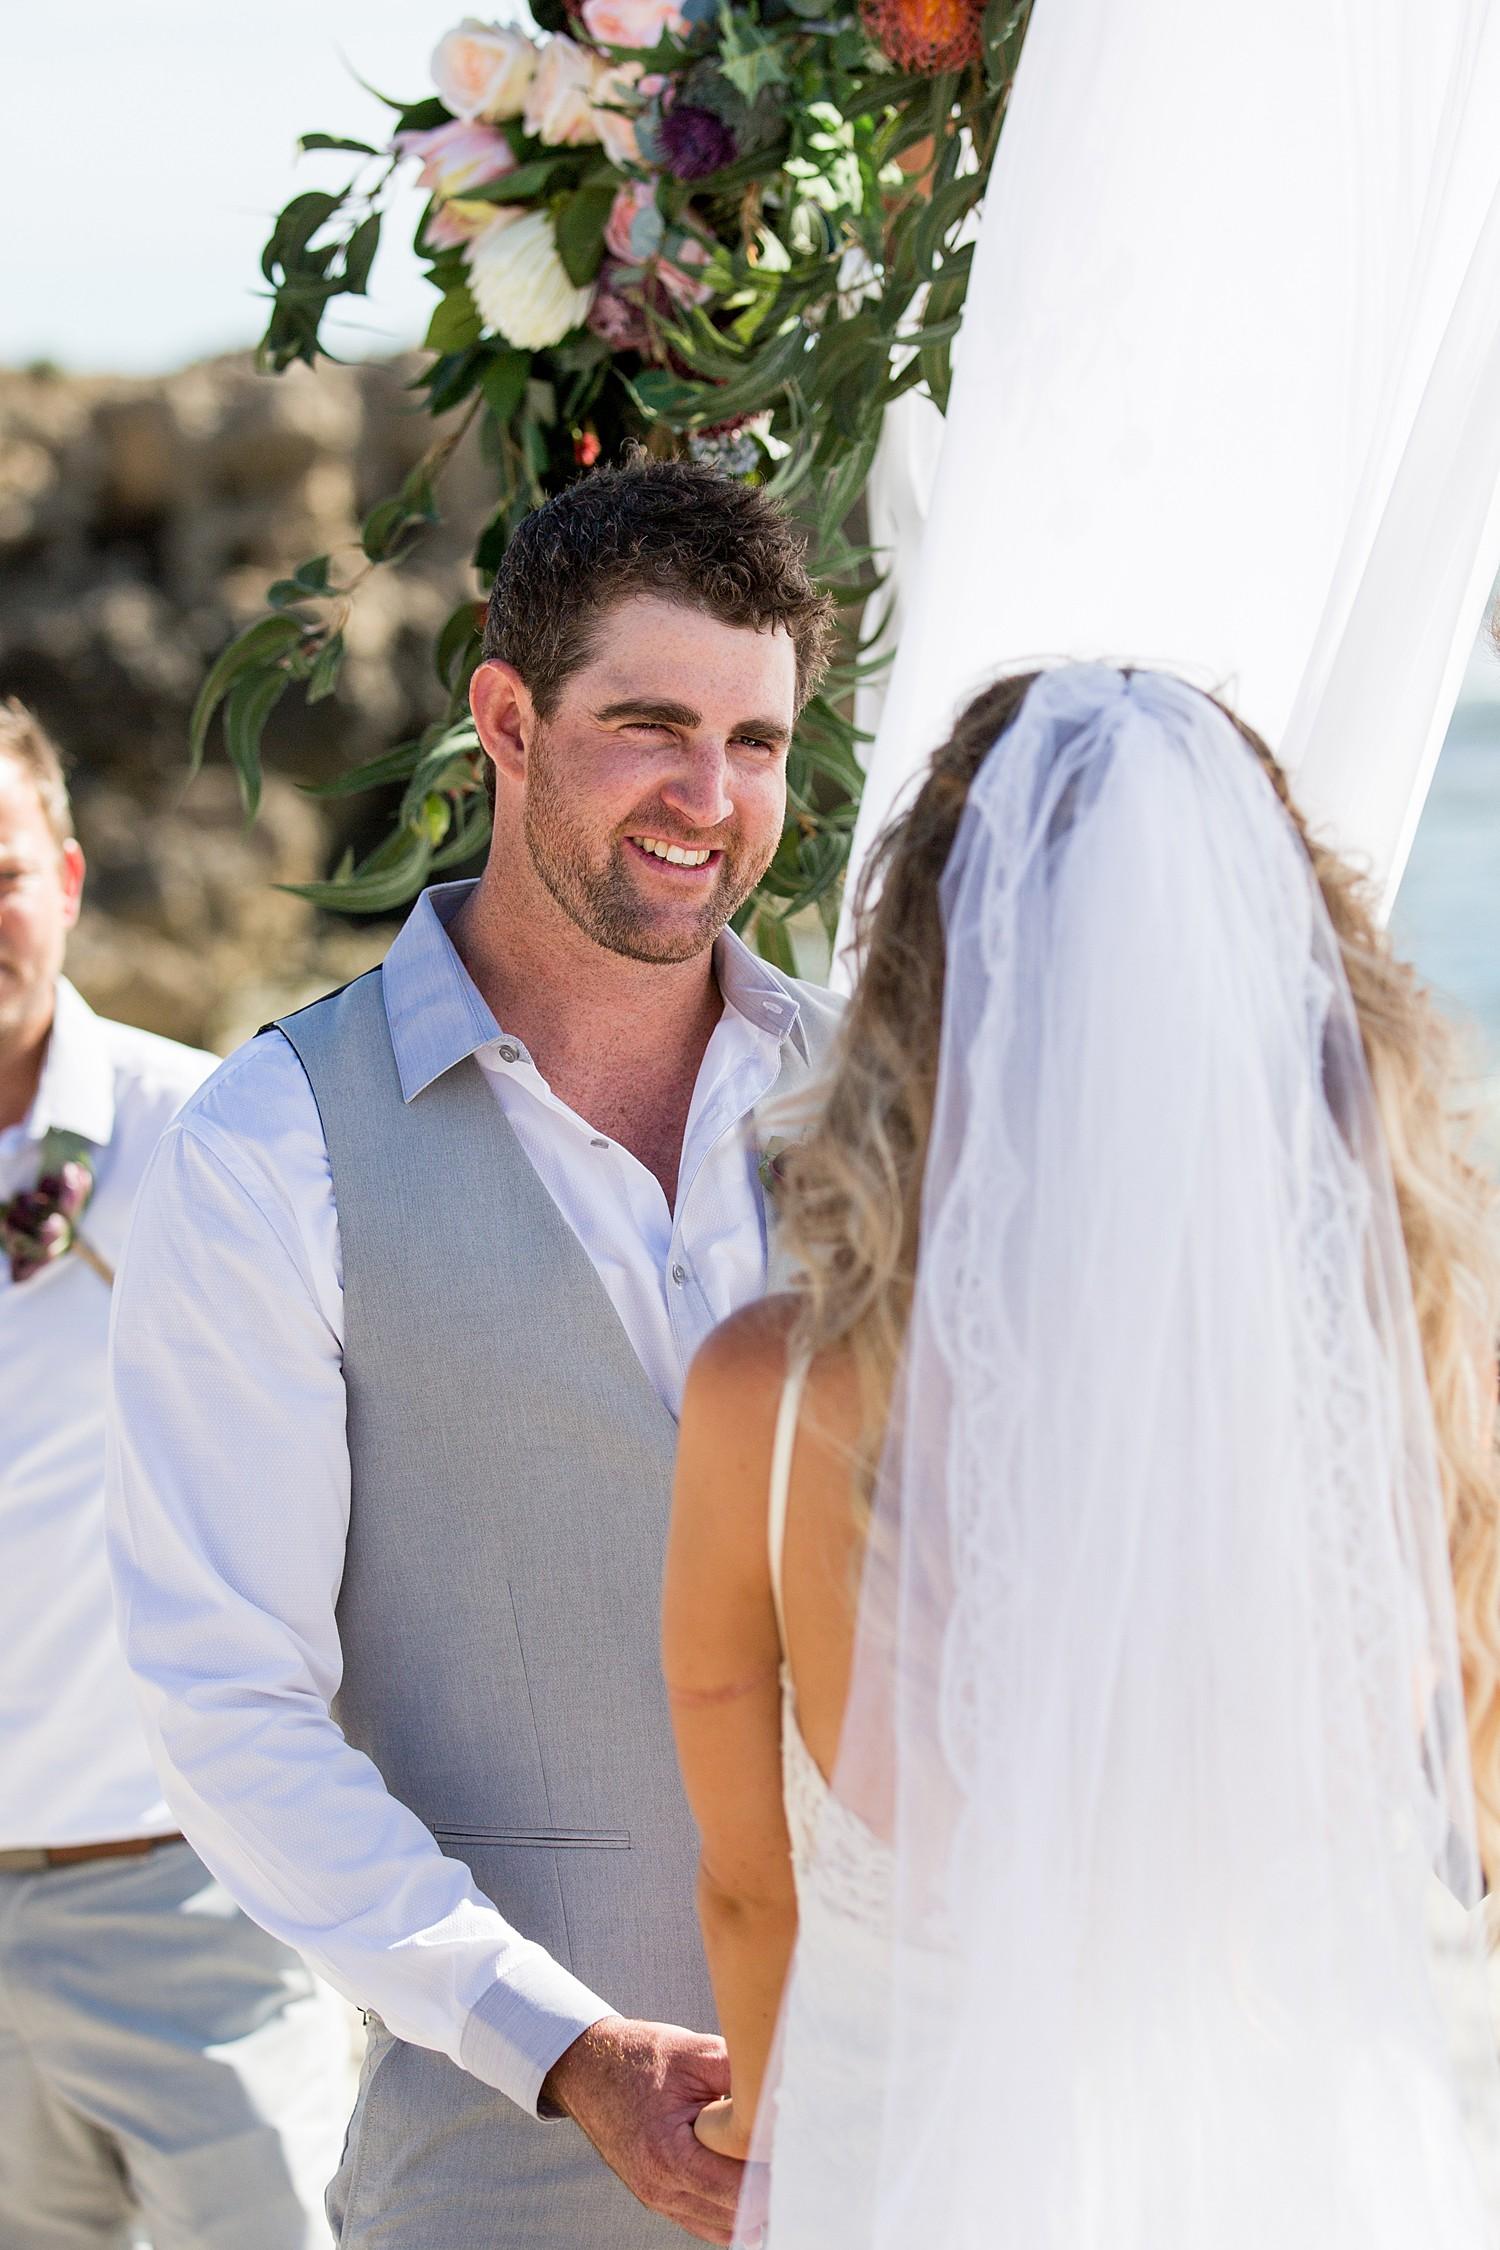 trigg_beach_wedding_perth (39).jpg